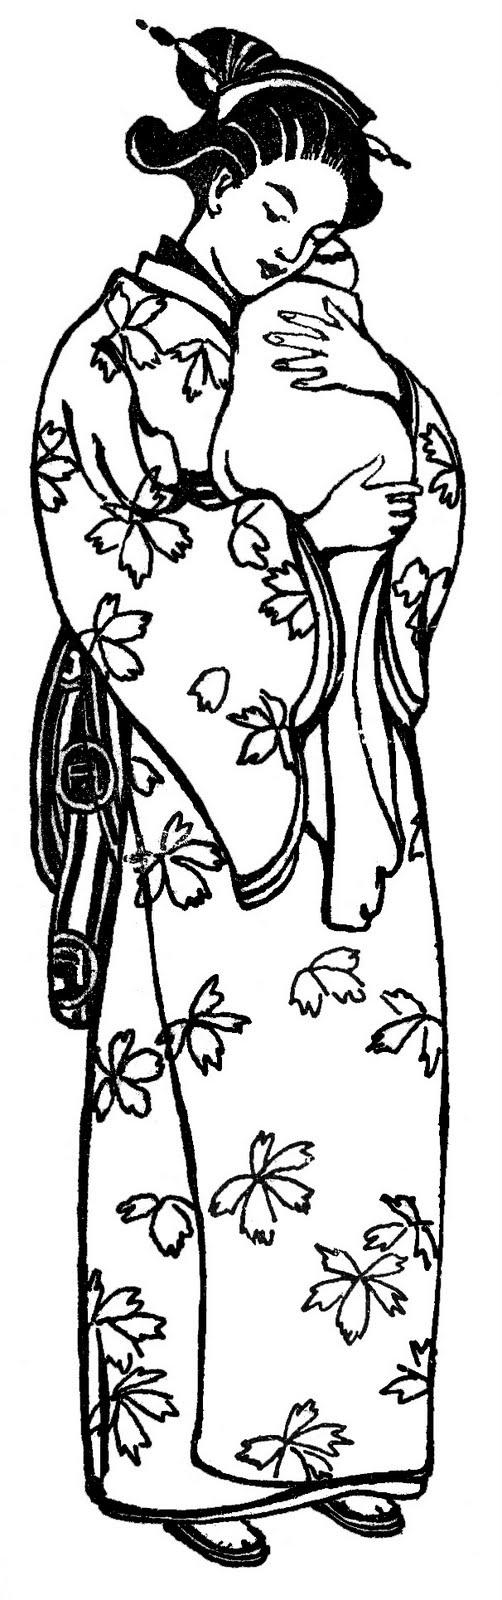 Kimono clipart japanese child Images Fairy Kimono  LLC*: